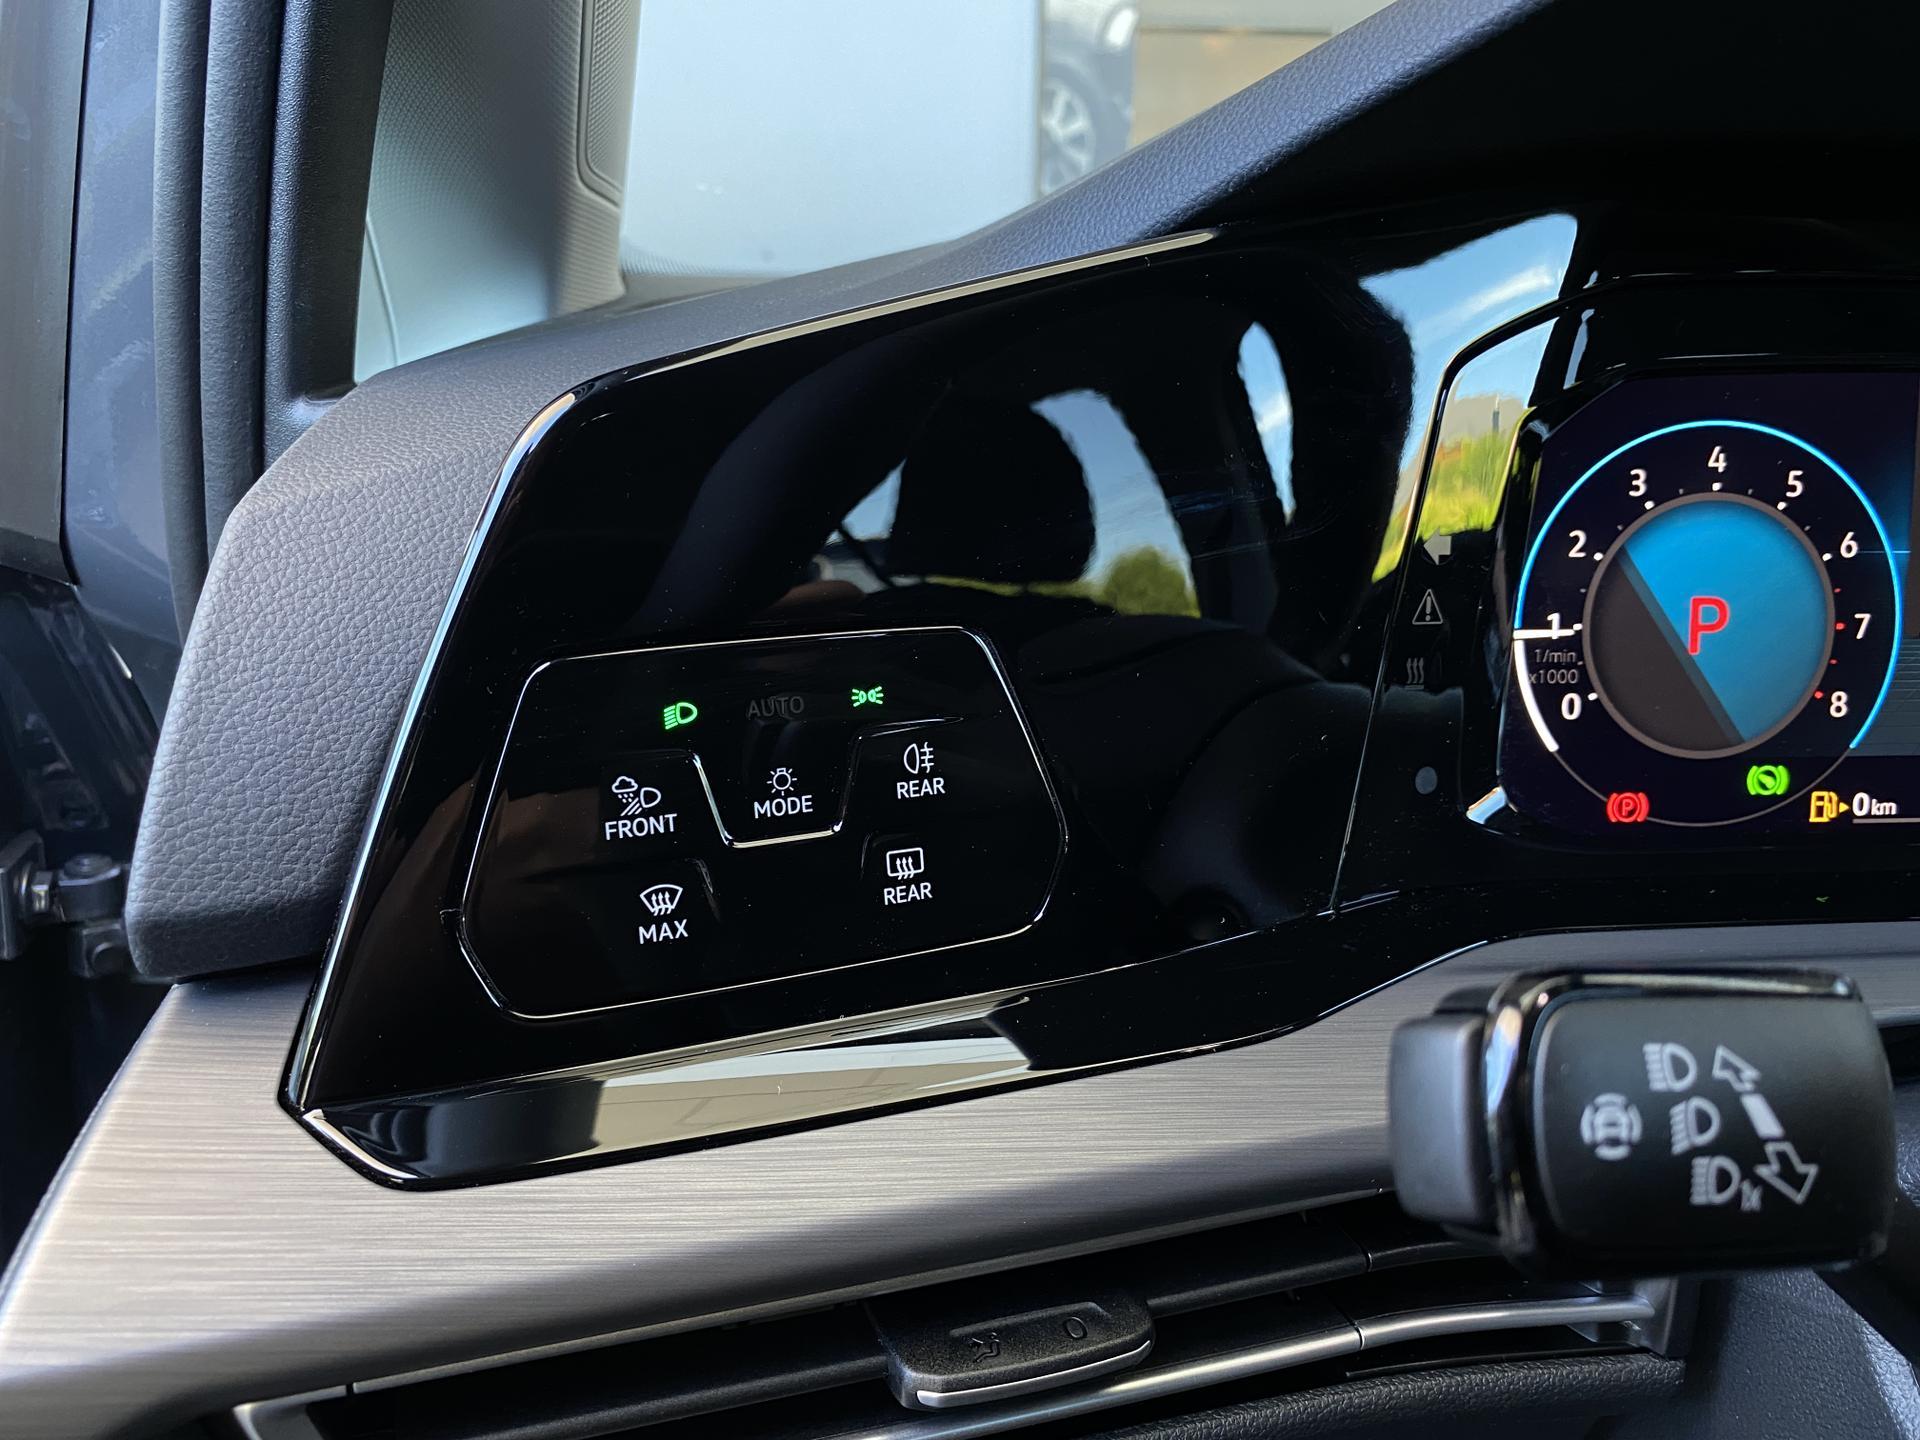 VW Golf Variant Innenraum Highlights